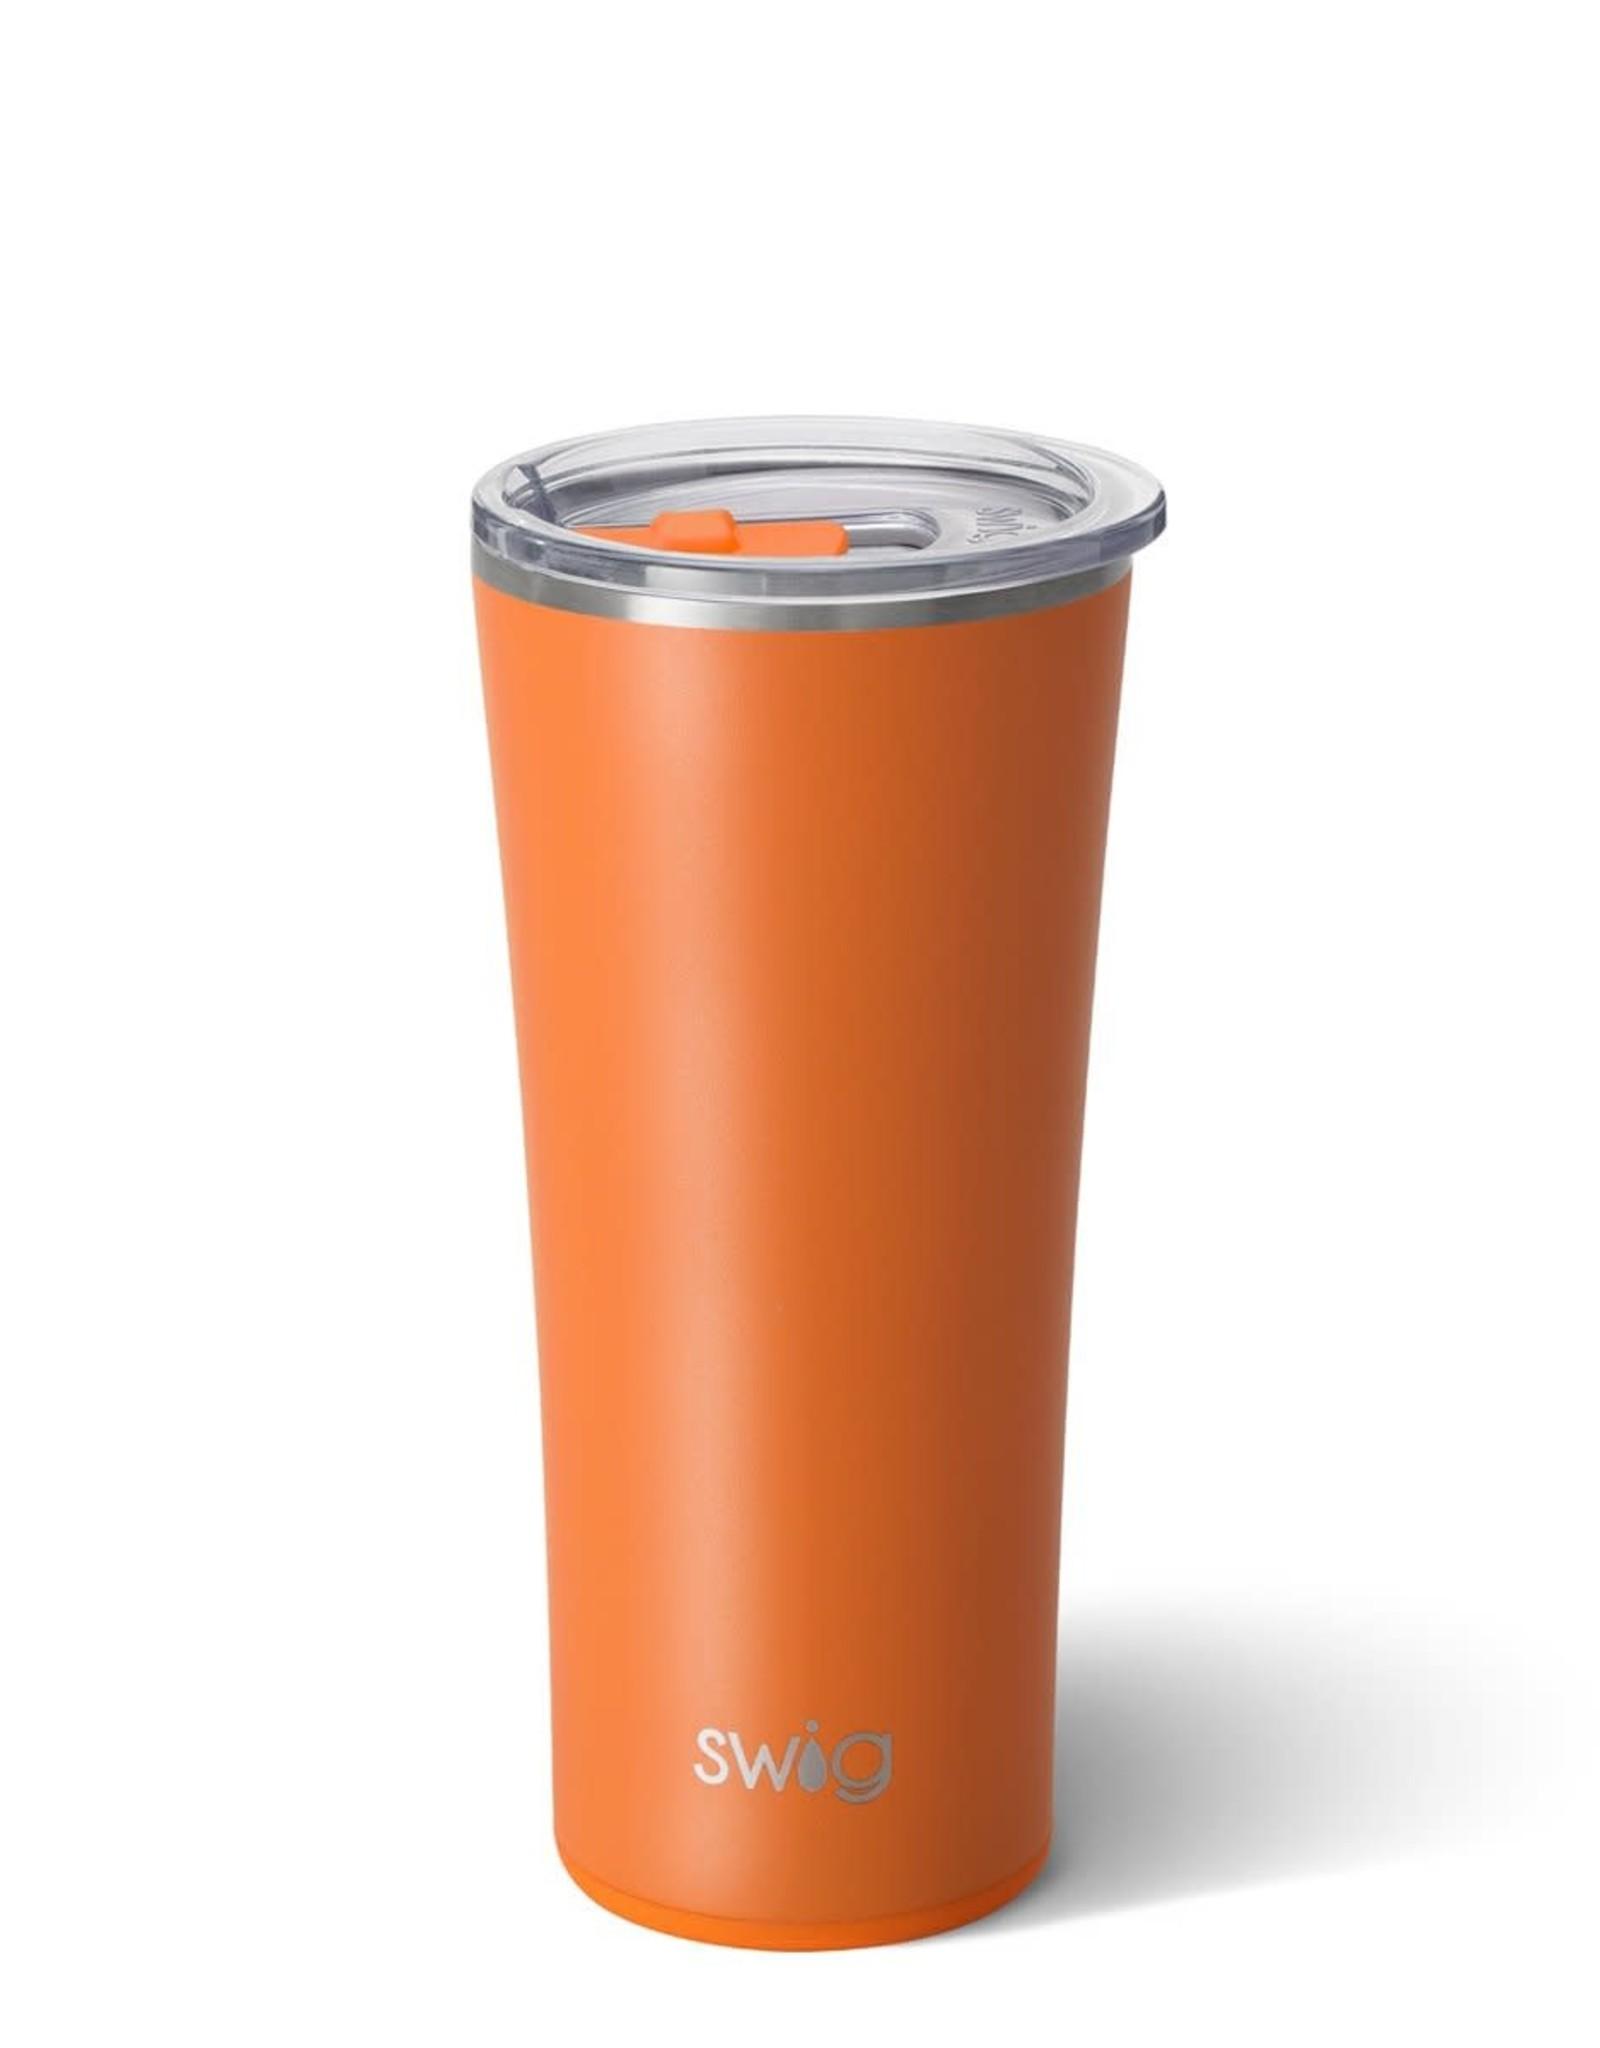 Swig Swig 22 OZ Tumbler Orange